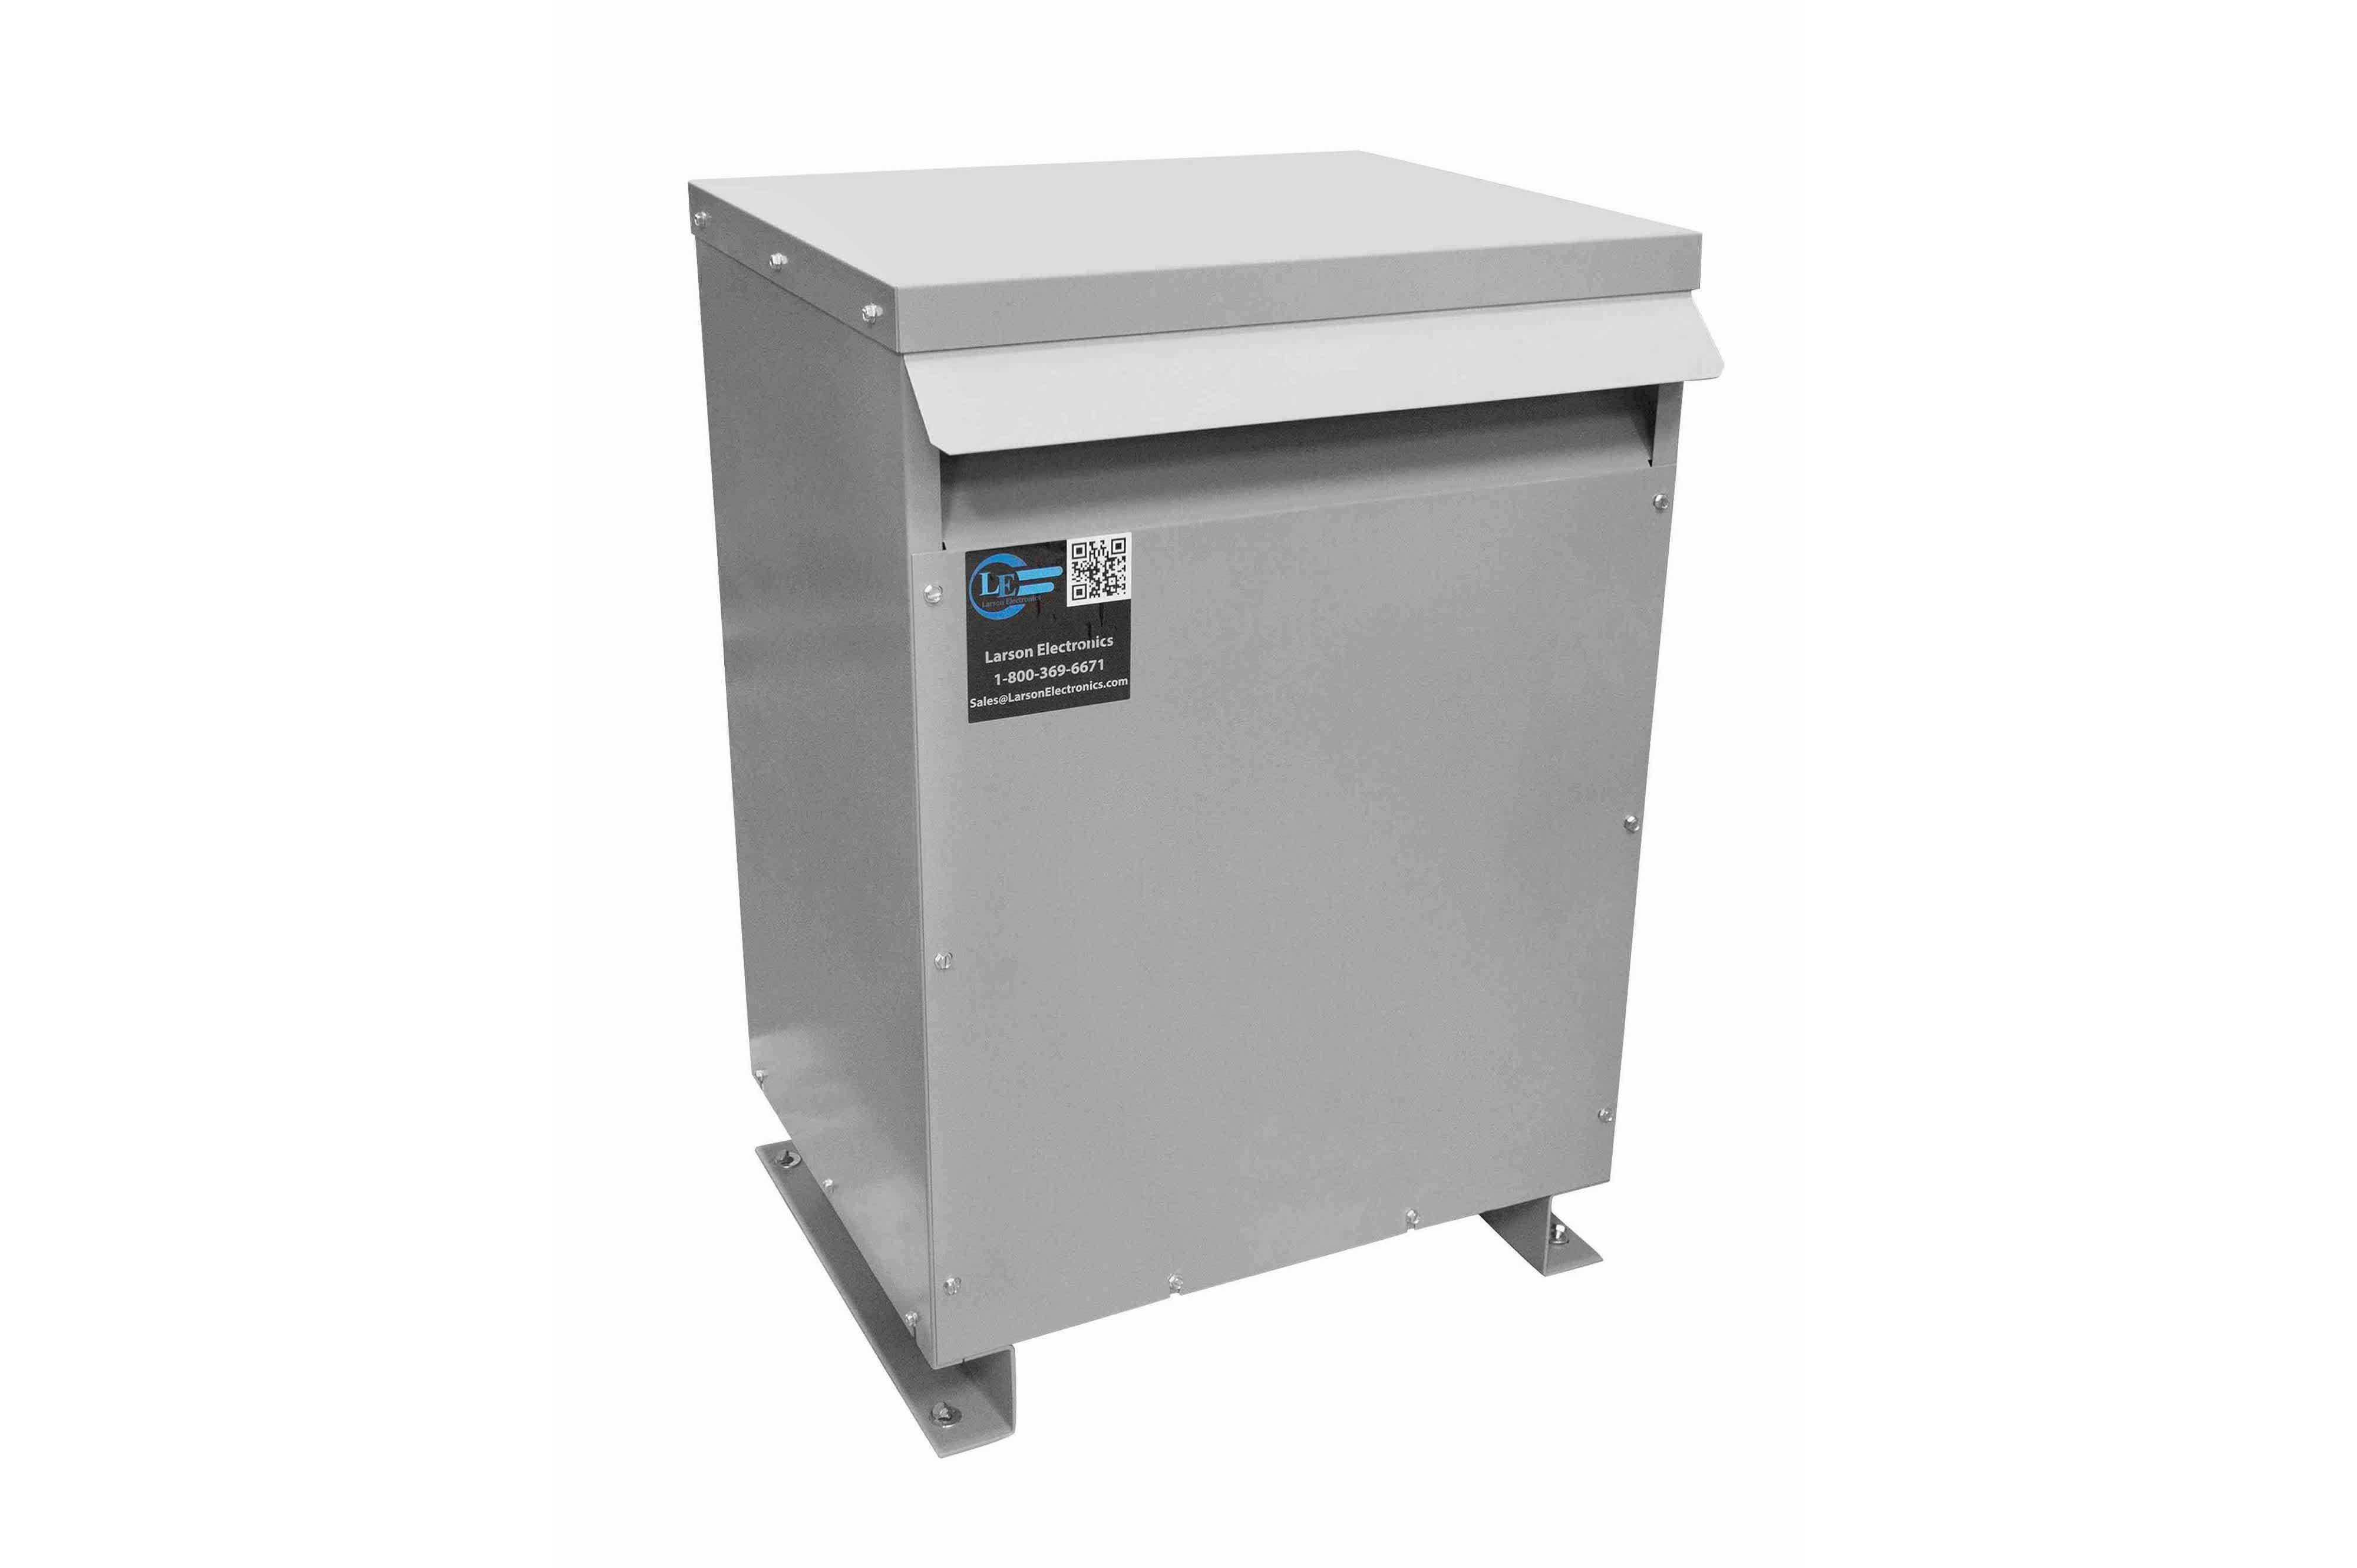 13 kVA 3PH Isolation Transformer, 600V Wye Primary, 415V Delta Secondary, N3R, Ventilated, 60 Hz